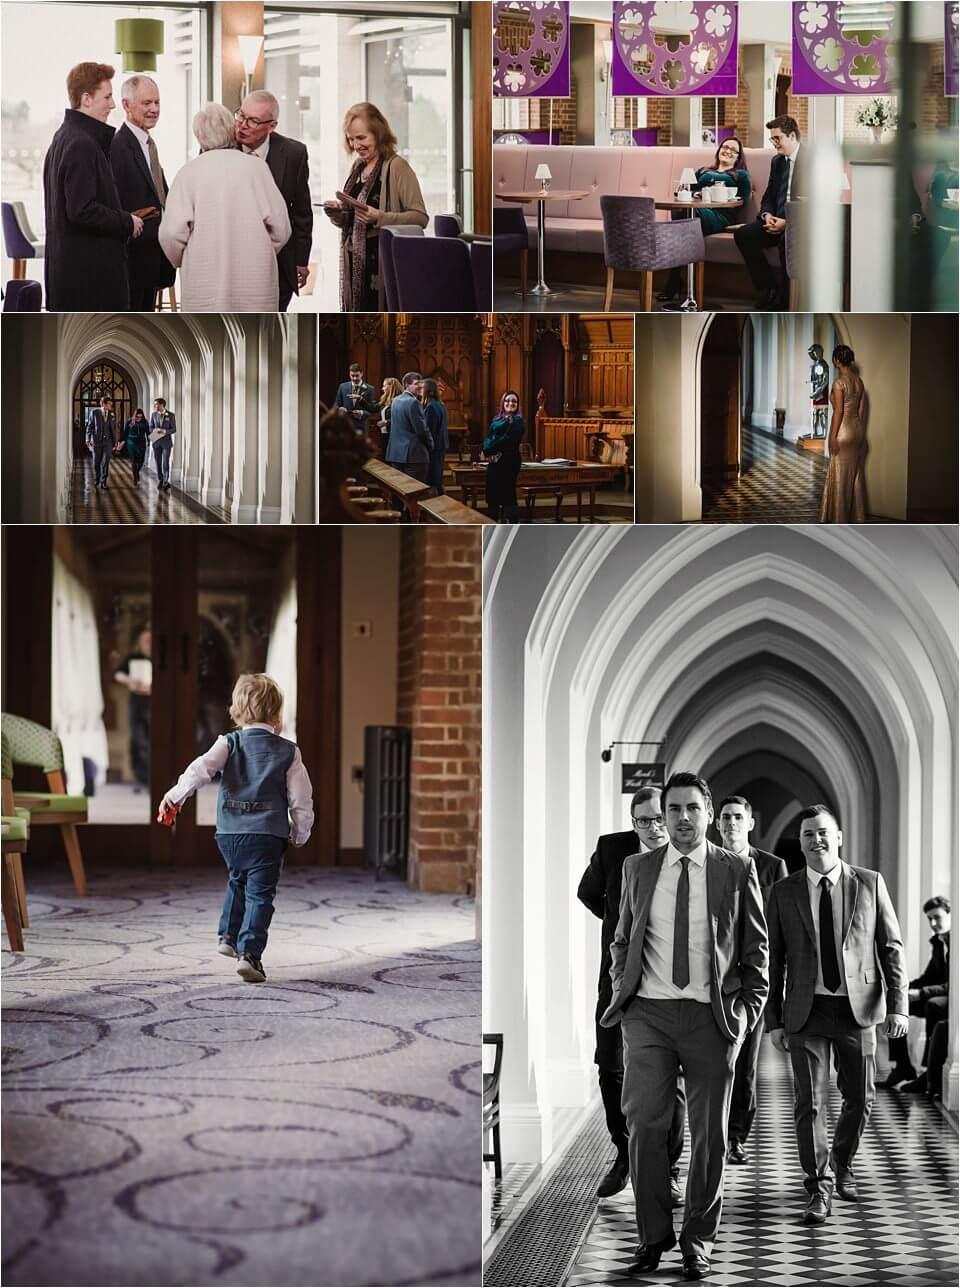 Stanbrook Abbey Photographer